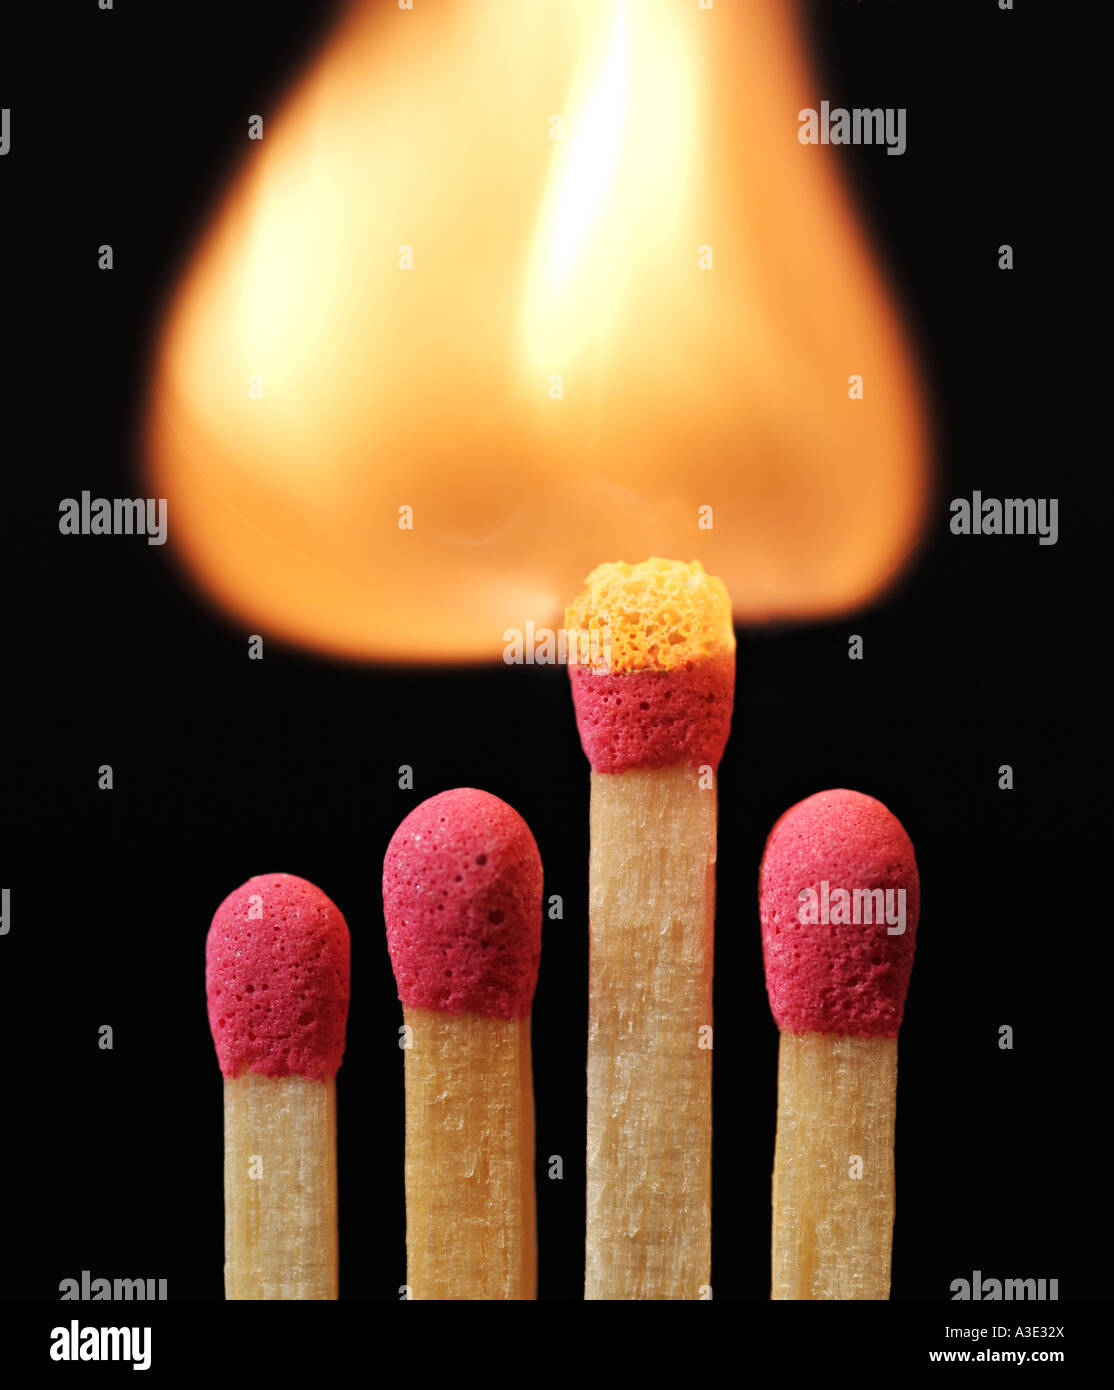 Lit Match - Stock Image